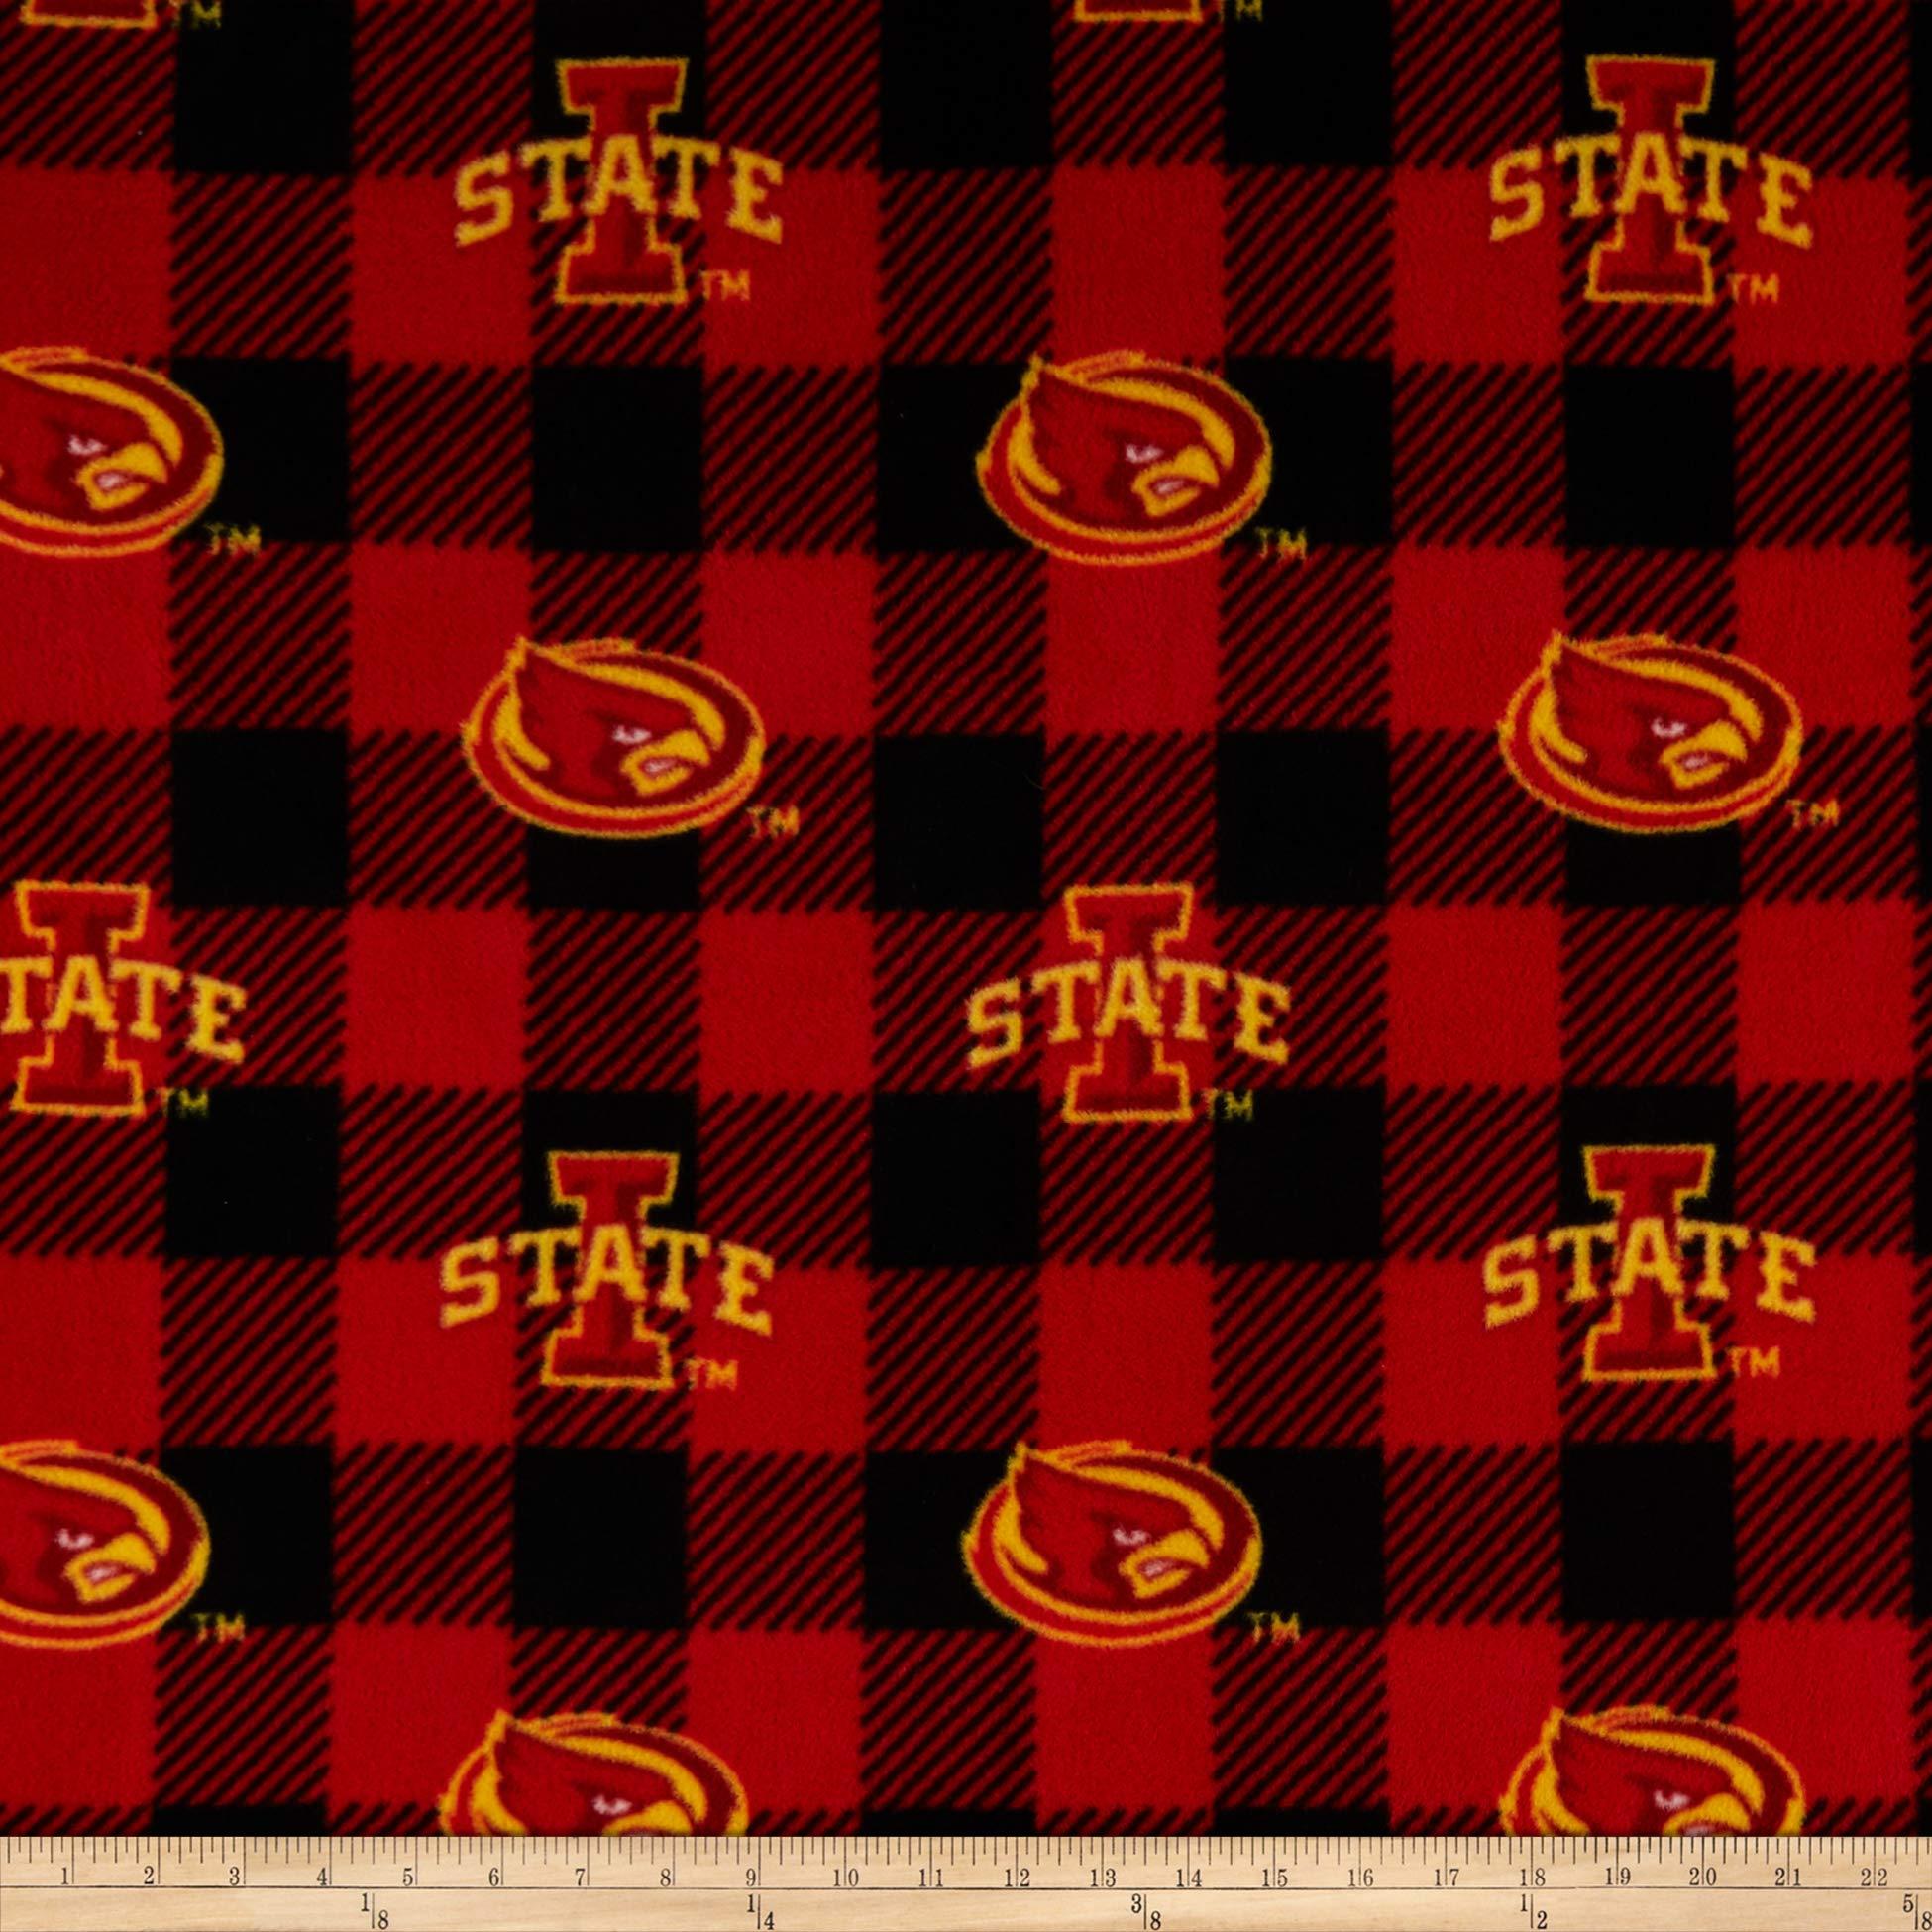 SYKEL University of Iowa Hawkeyes Scenic Blanket Stadium Scene-University of Iowa Hawkeyes Fleece Blanket